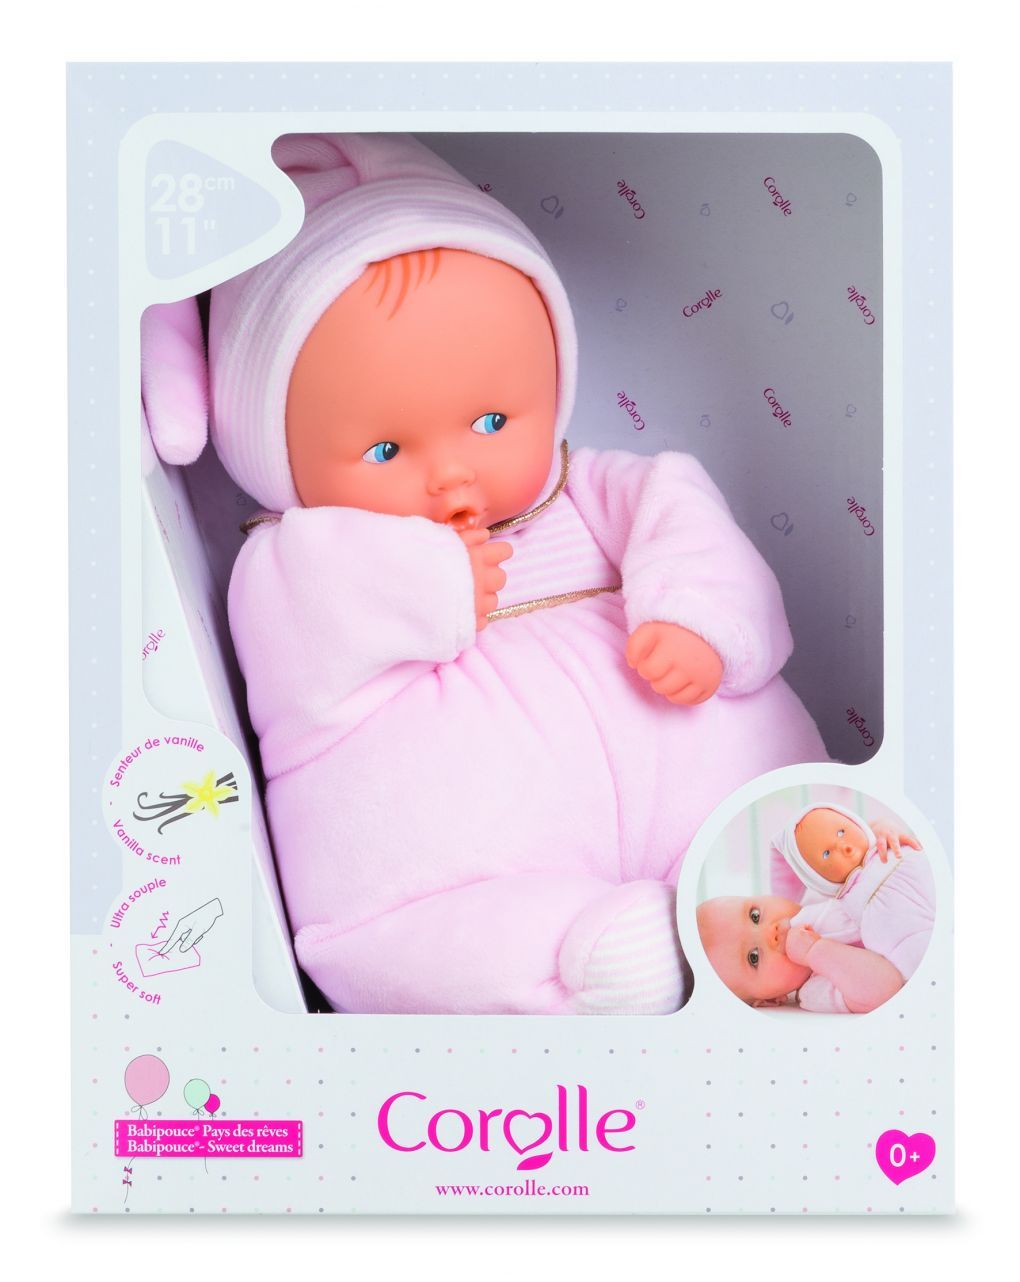 Corolle - babipouce - sweet dreams - Corolle